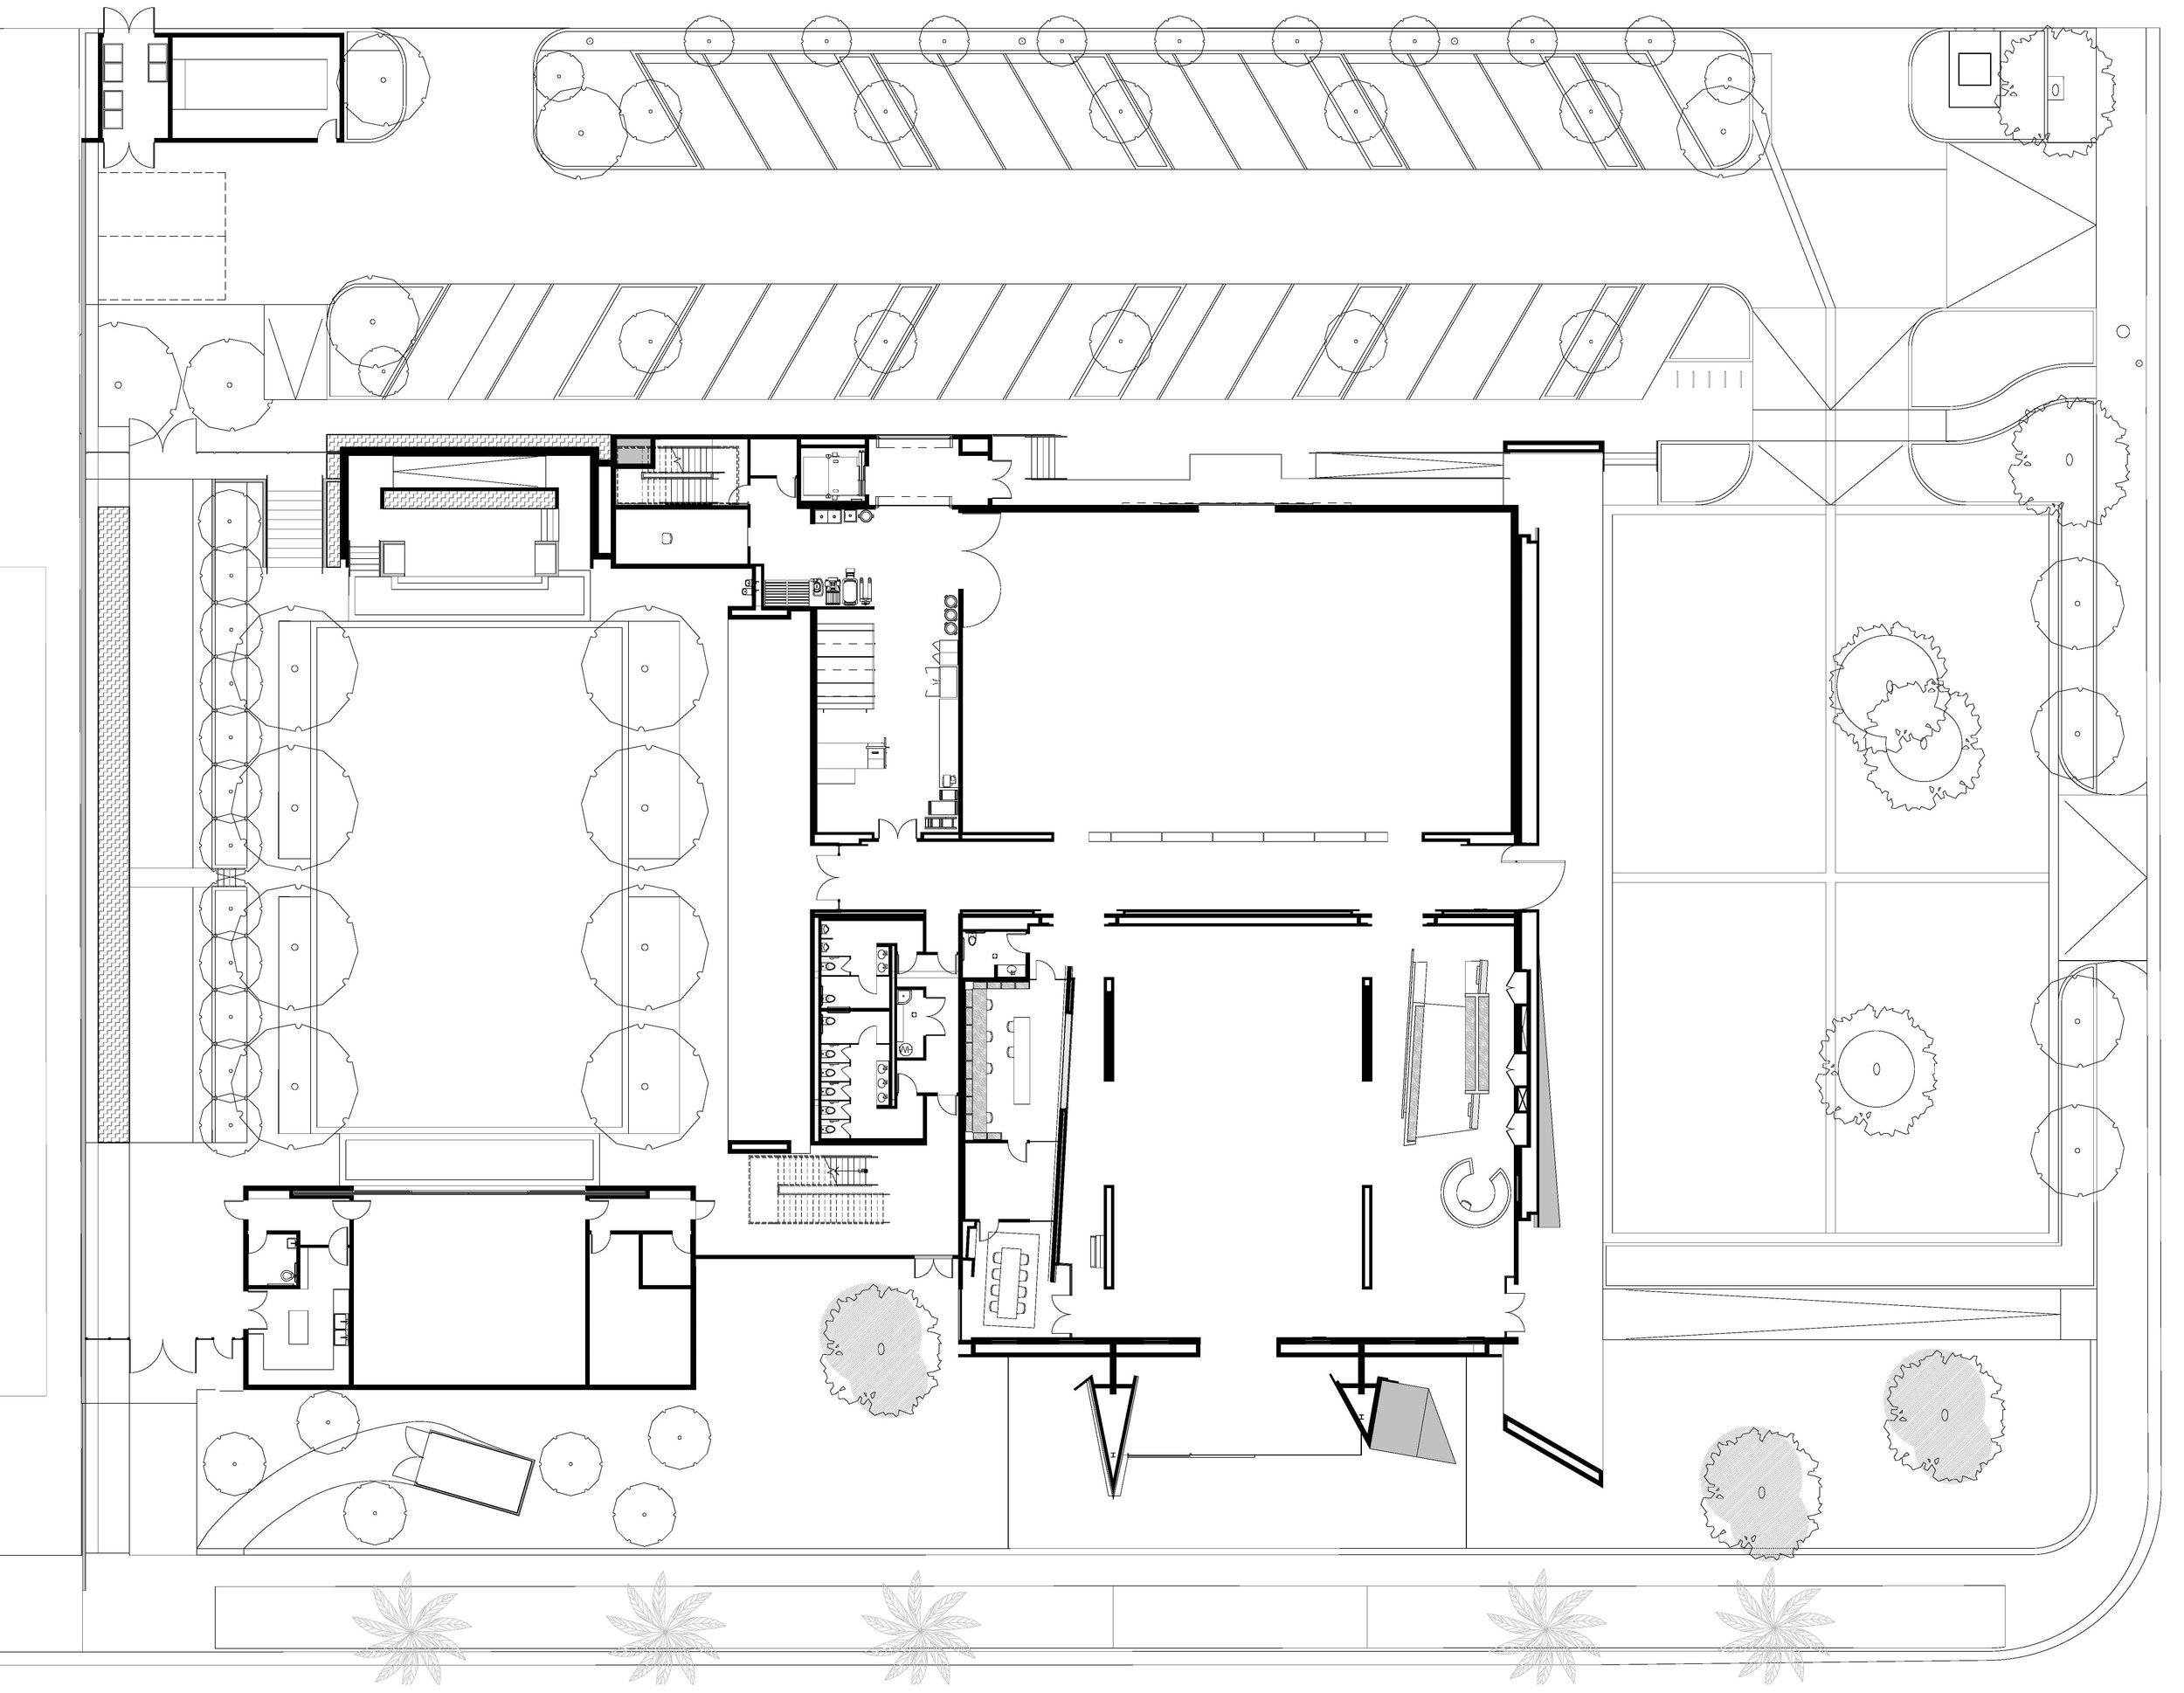 MUSEUM OF REDLANDS Site plan